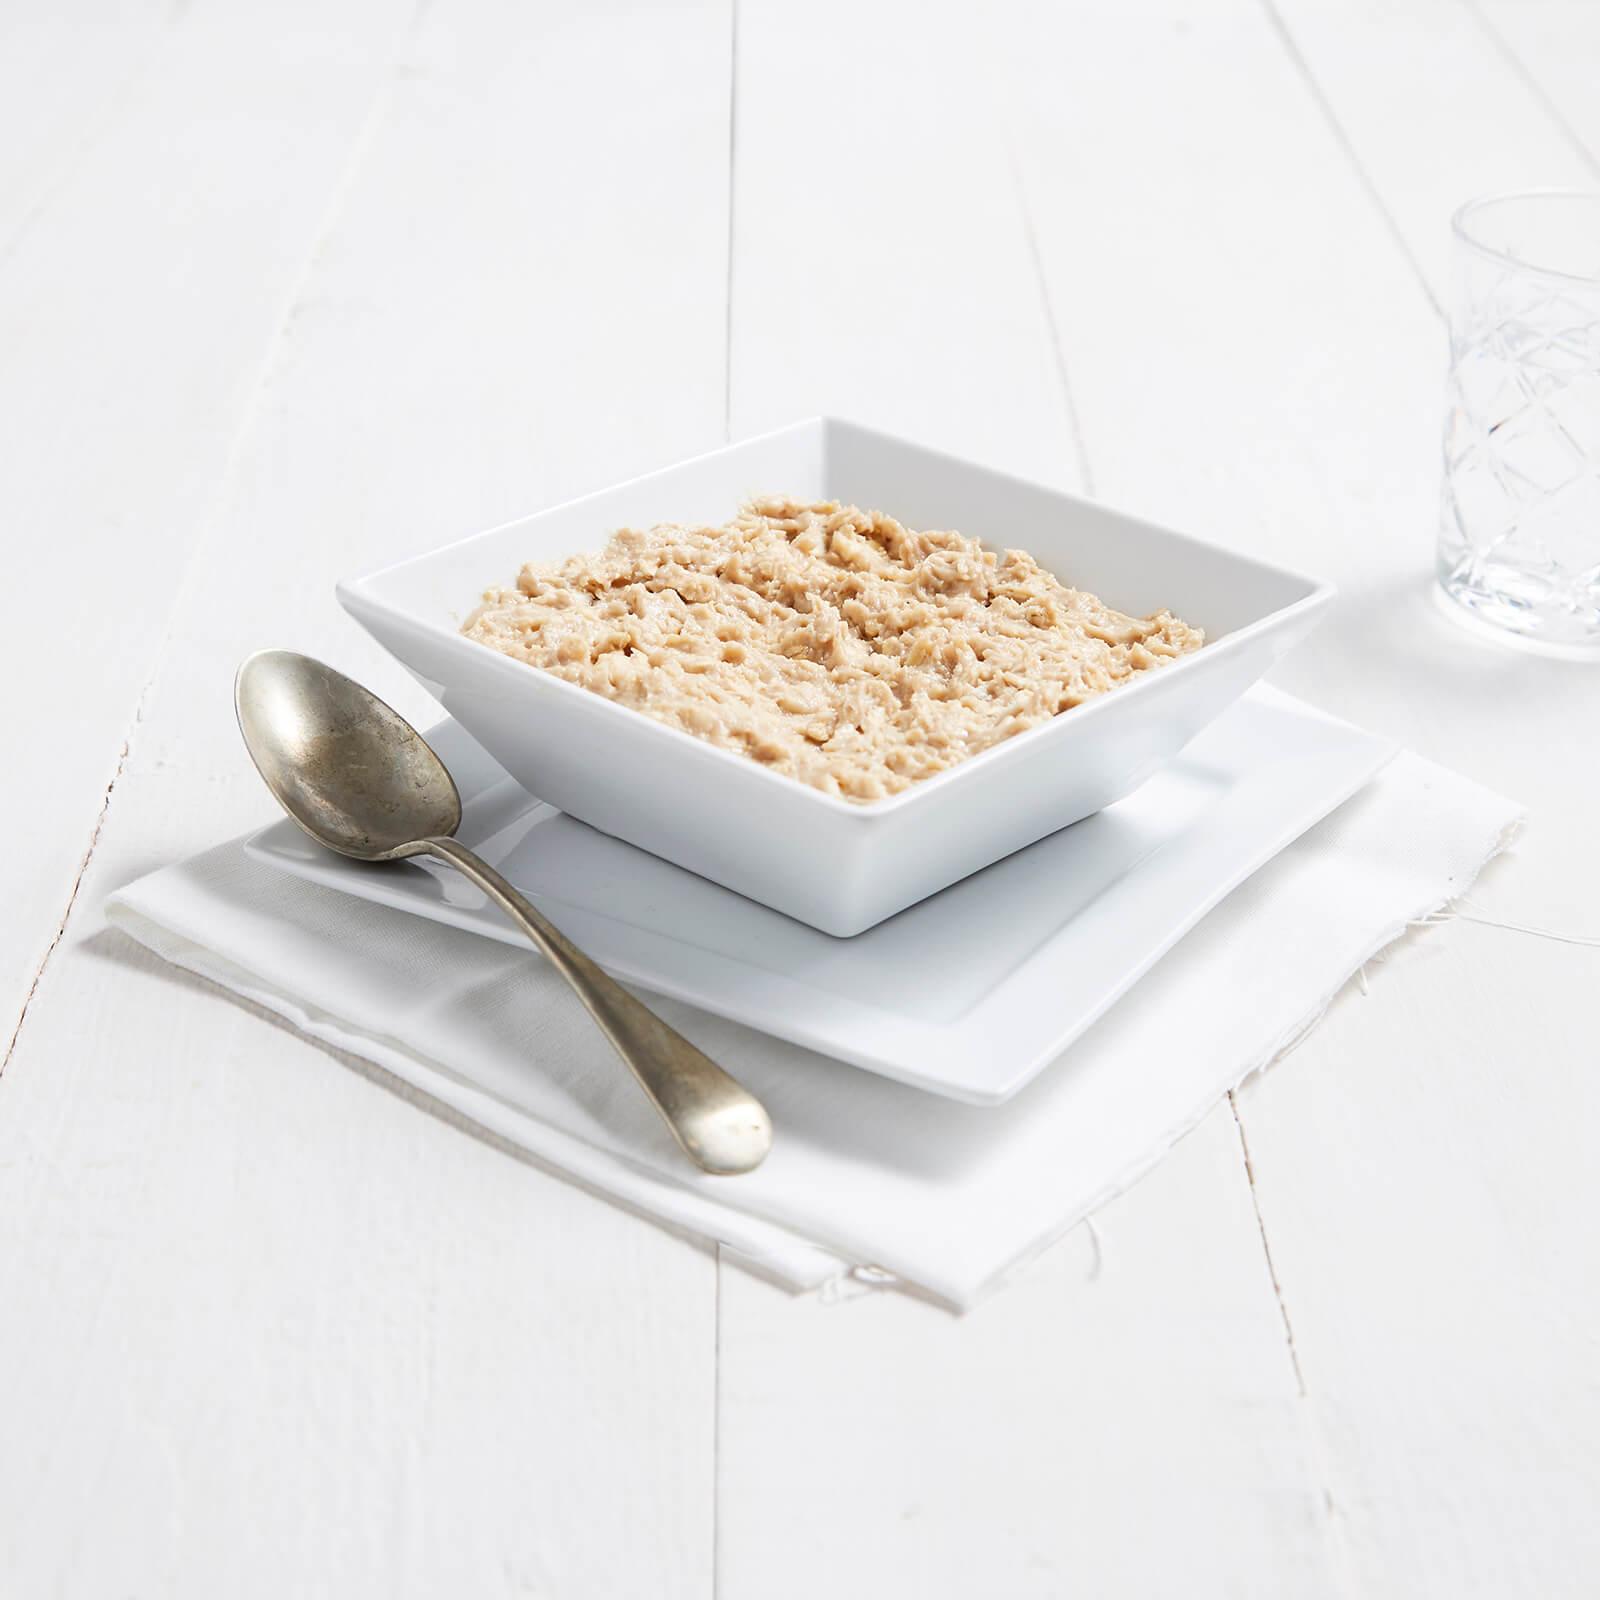 Exante Diet Meal Replacement Apple and Cinnamon Porridge